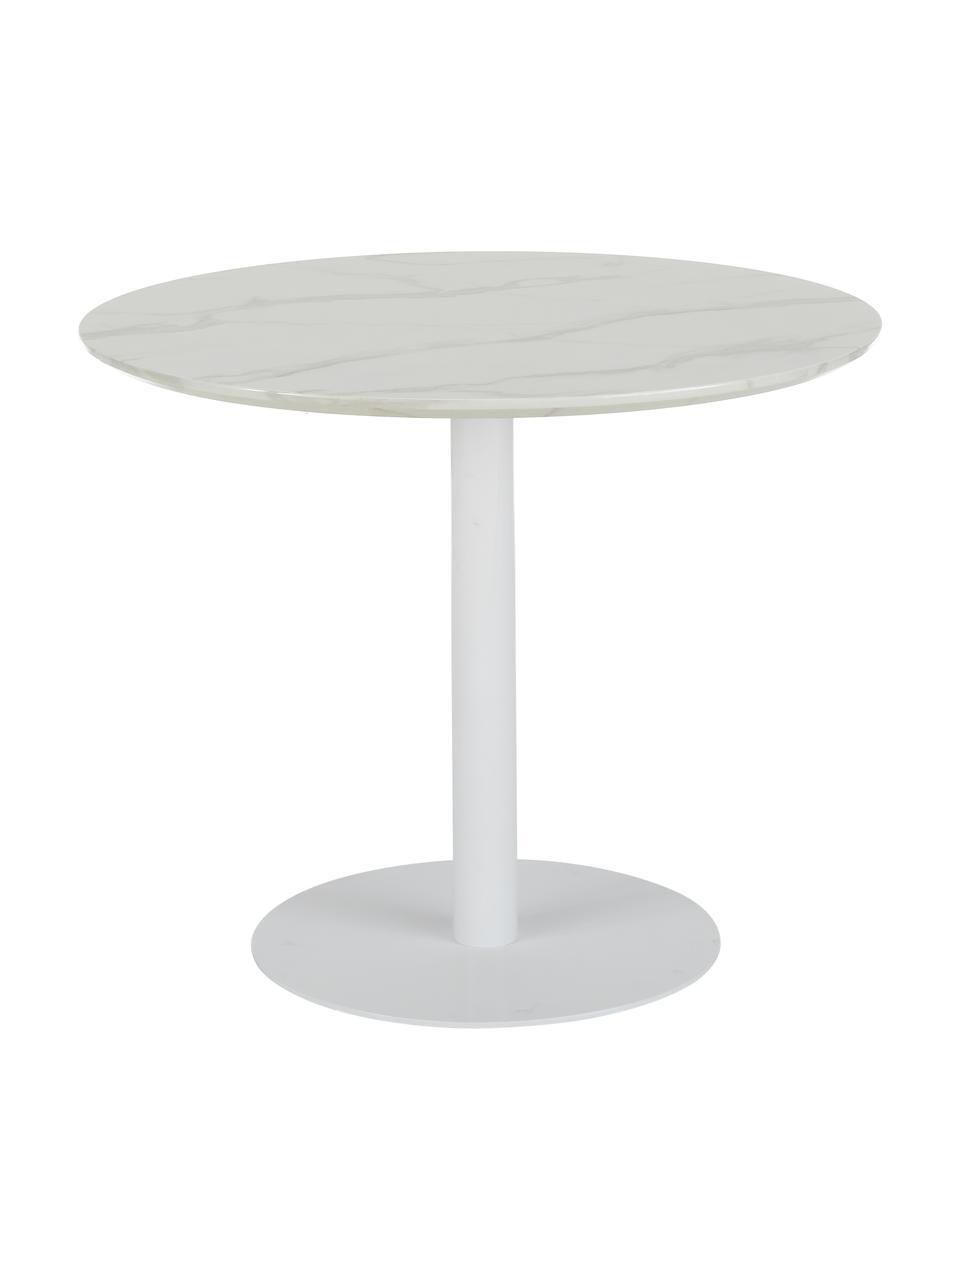 Runder Esstisch Karla in Marmor Optik in Weiß